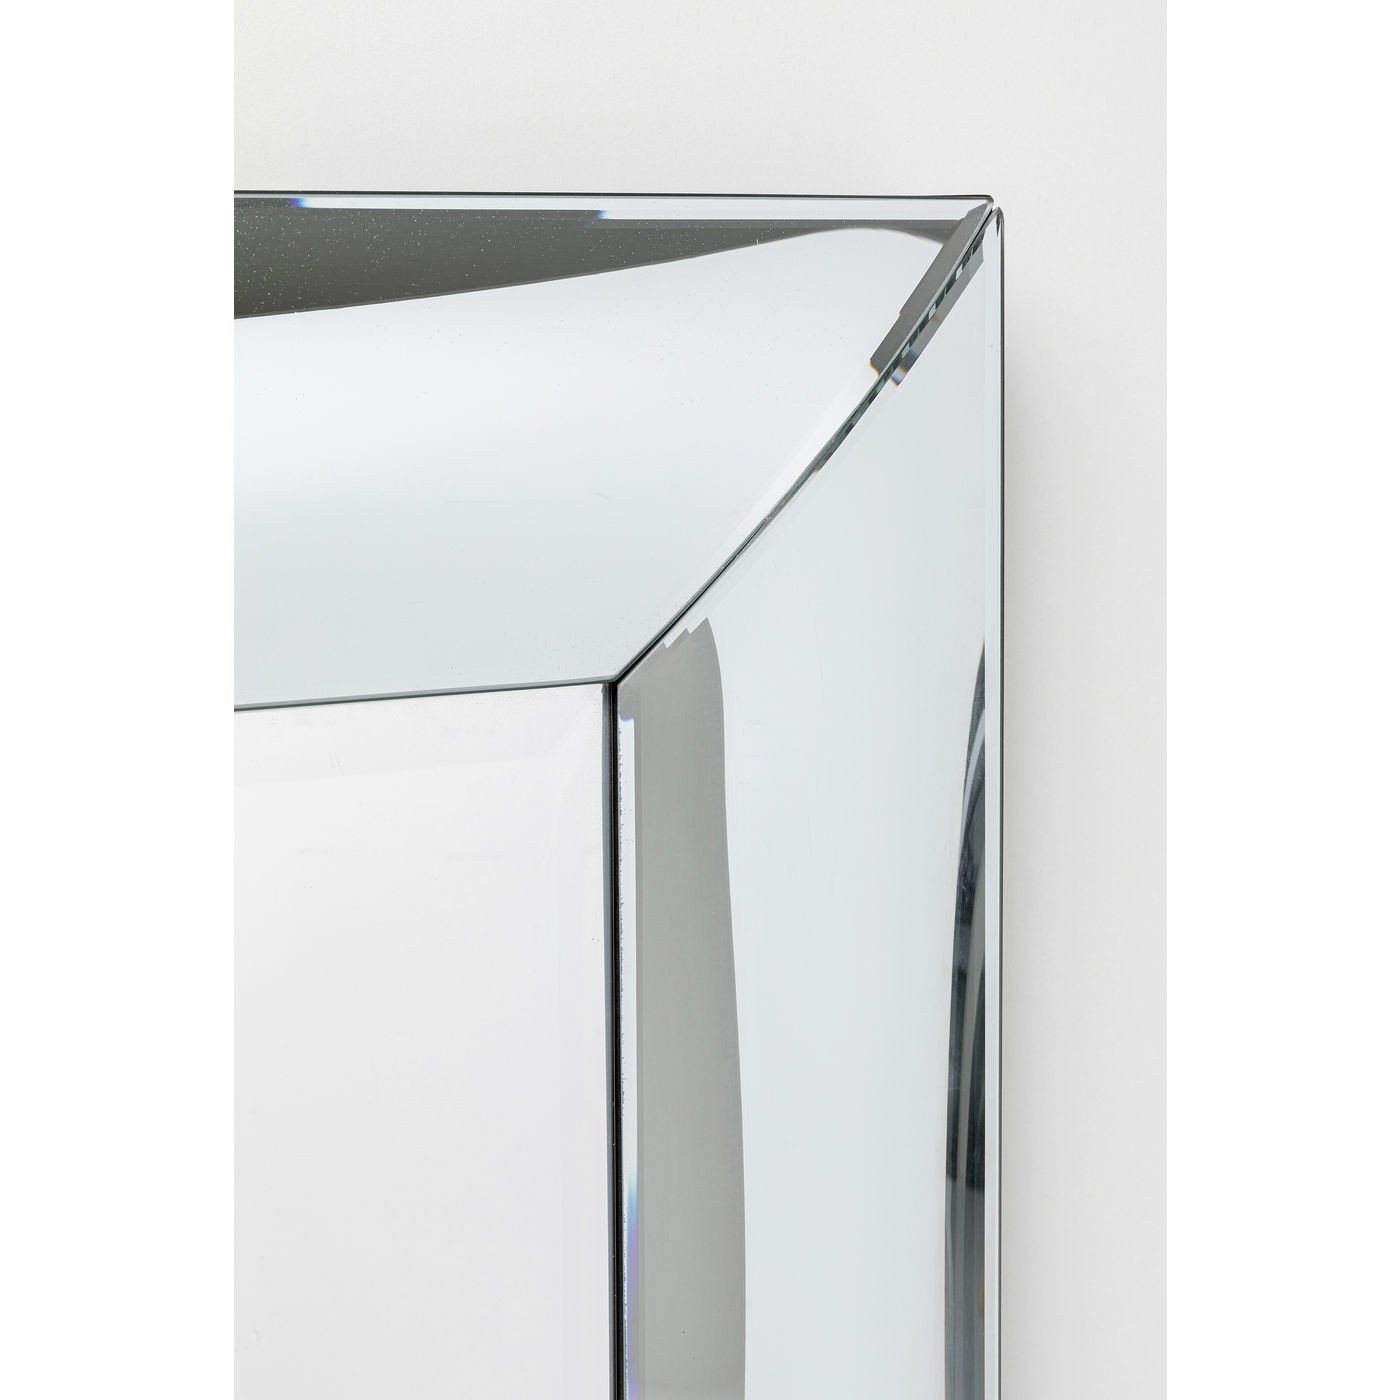 Miroir Bounce rectangulaire 120x80cm Kare Design